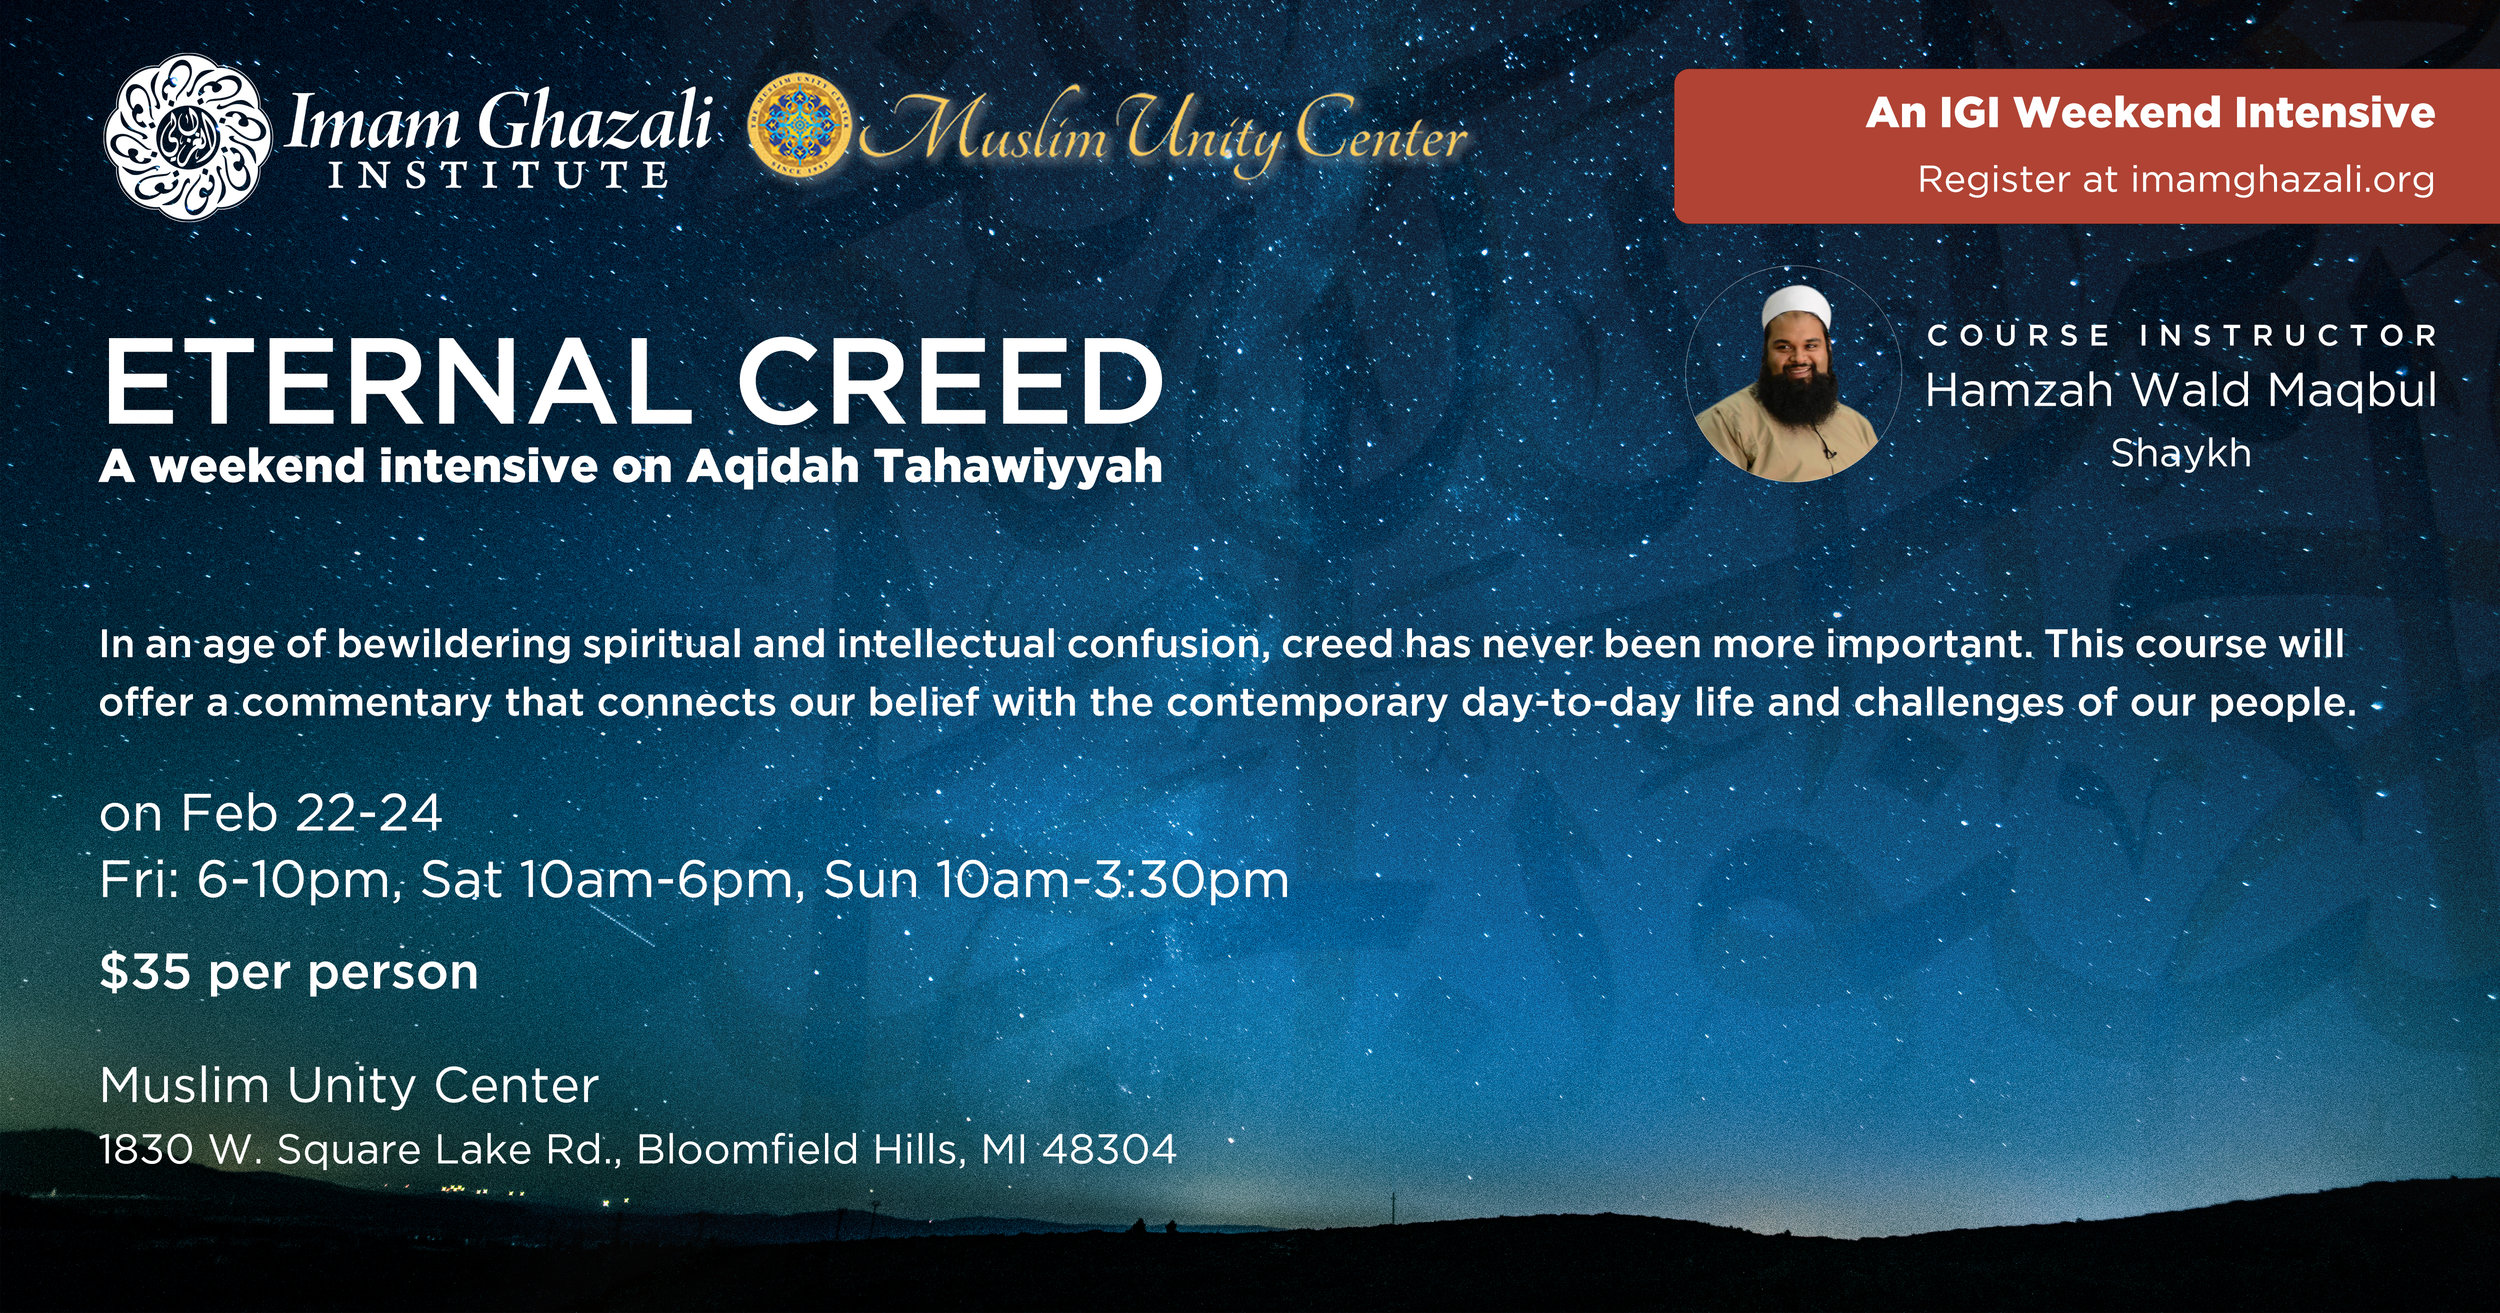 Eternal Creed Michigan Muslim Unity Center copy.jpg